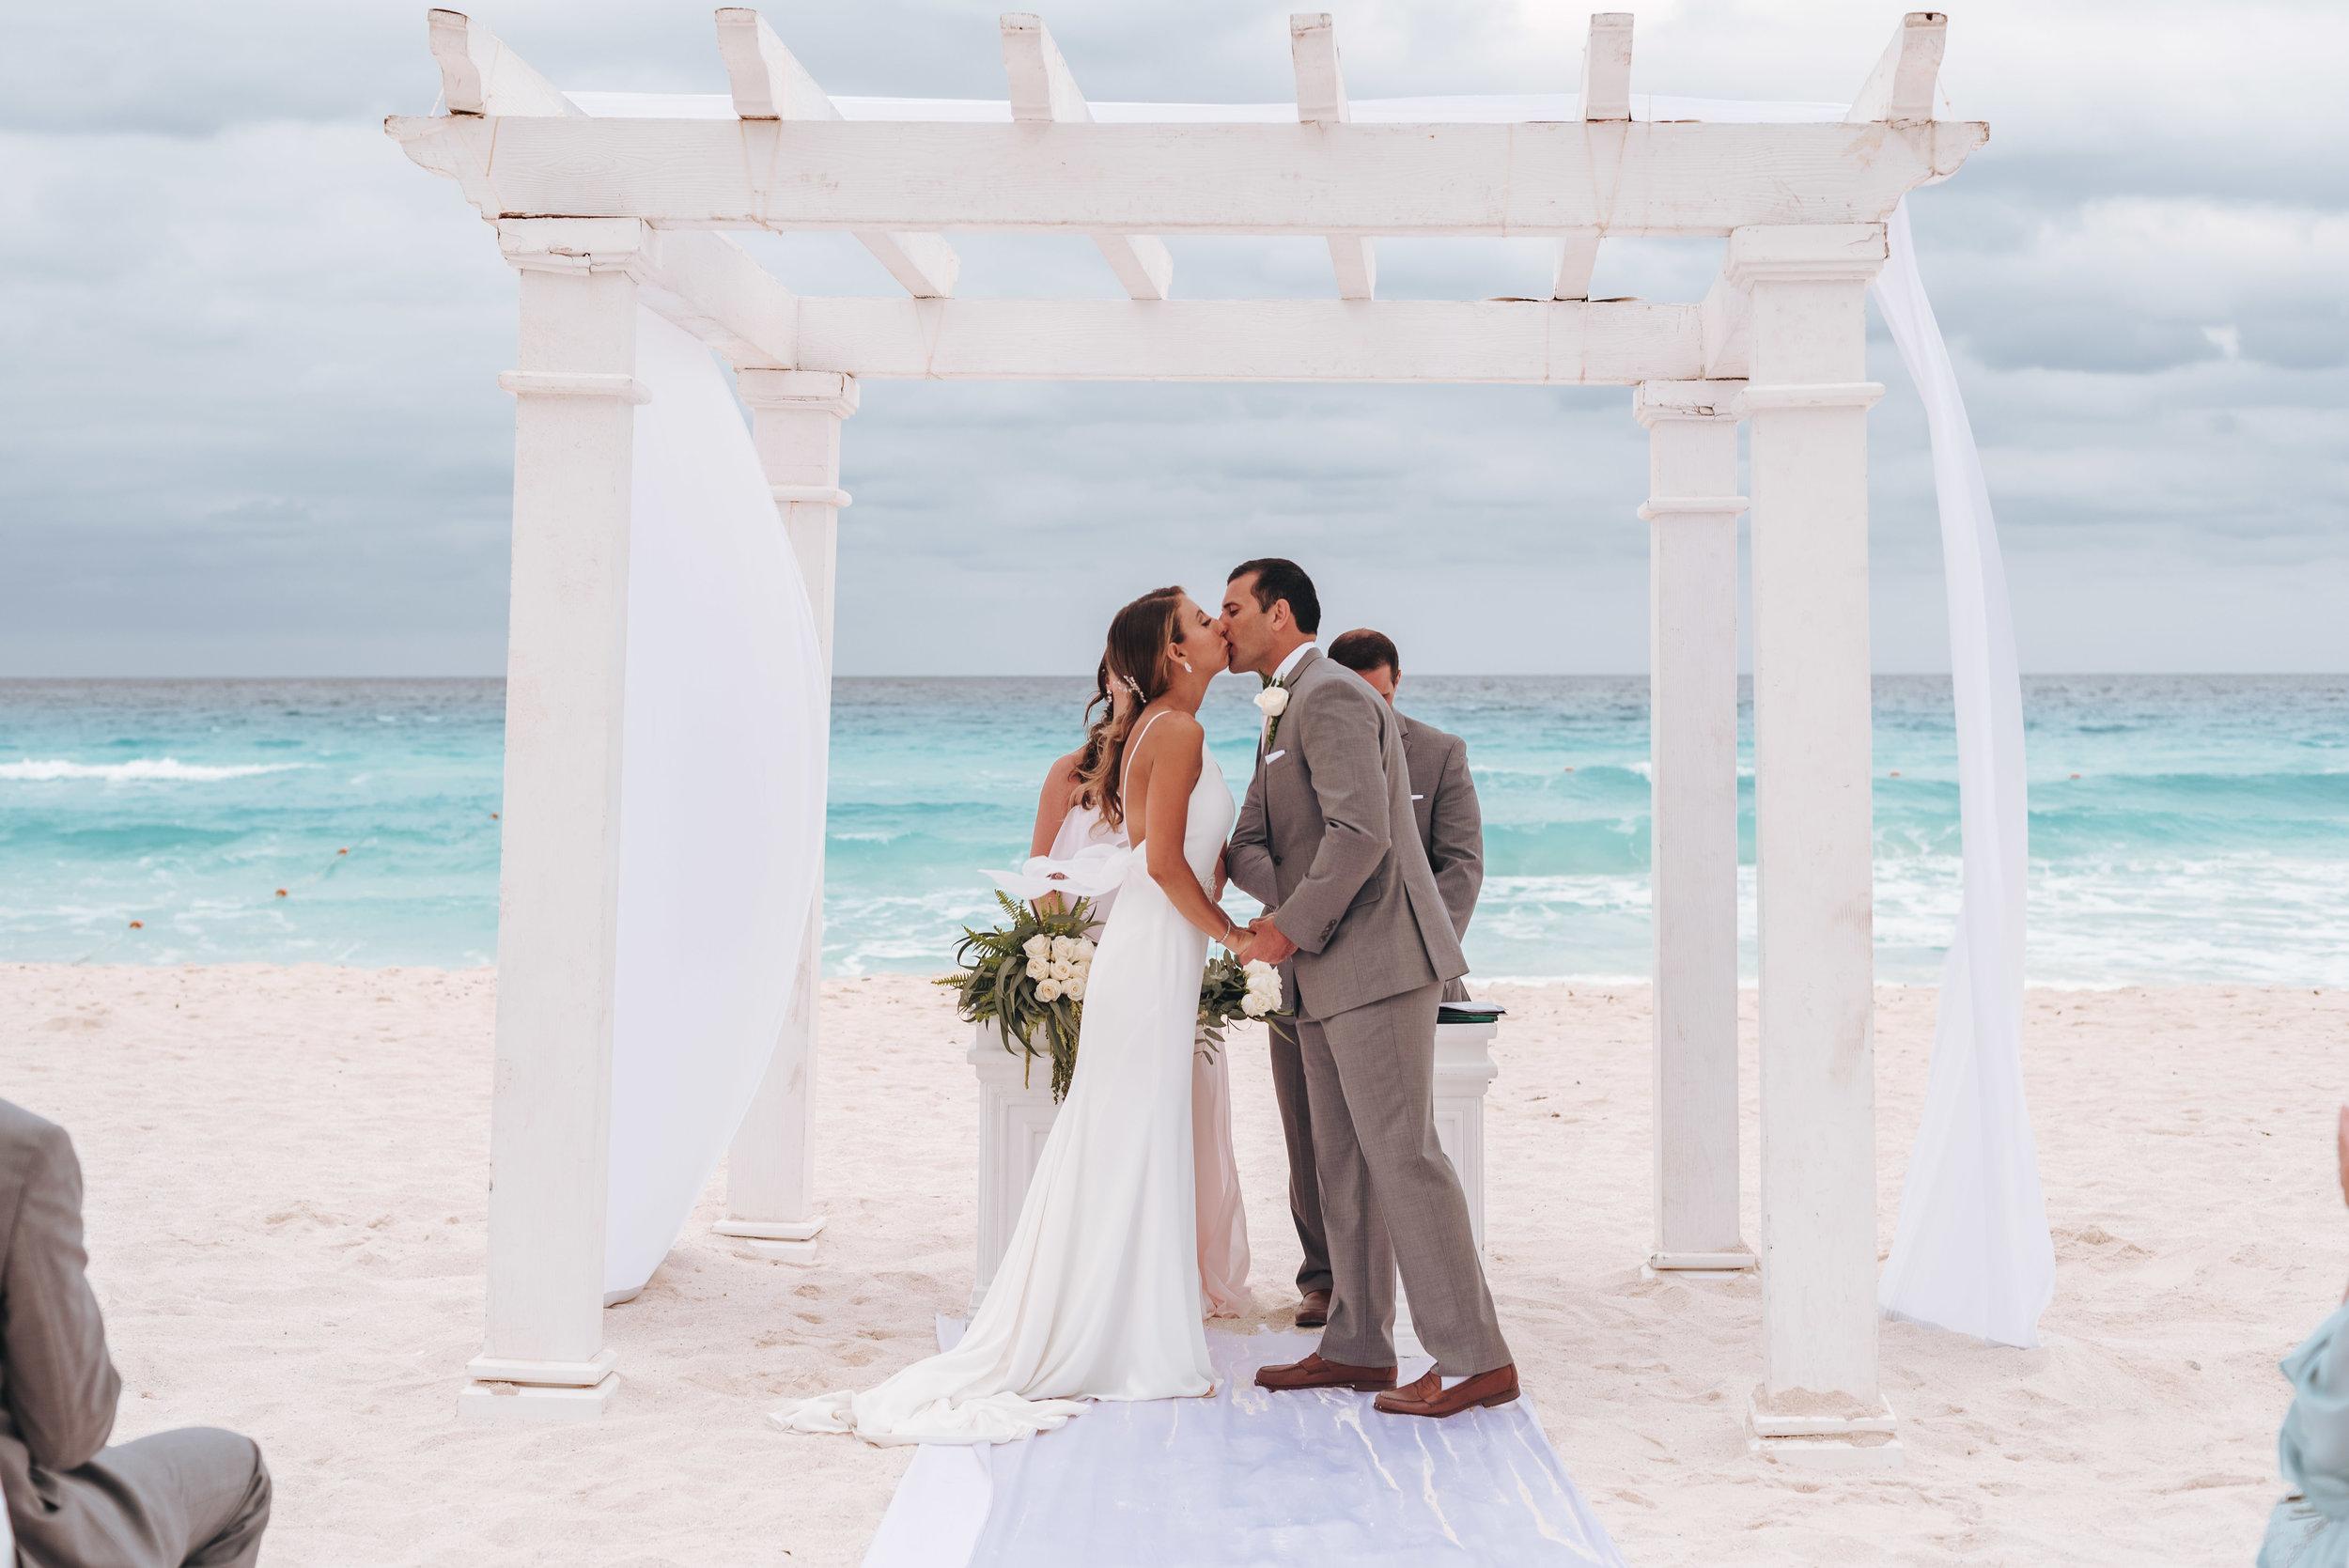 mexico_destination_wedding_ceremony-3.jpg